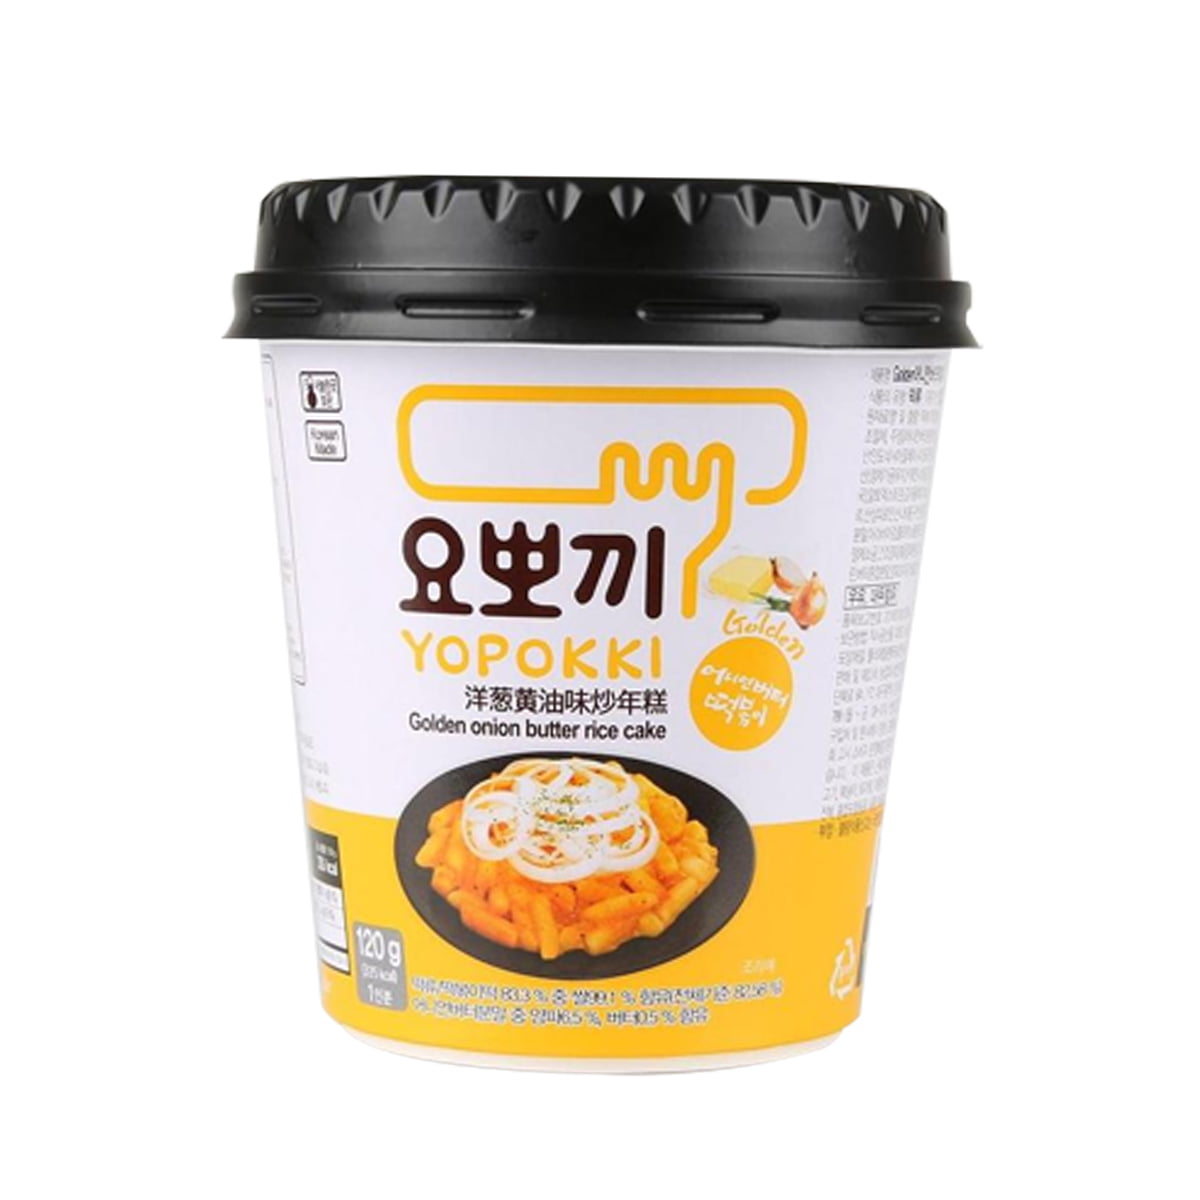 Yopokki Bolinho de Arroz Coreano Instantâneo sabor Molho de Cebola Cremosa Topokki Copo - 120 gramas